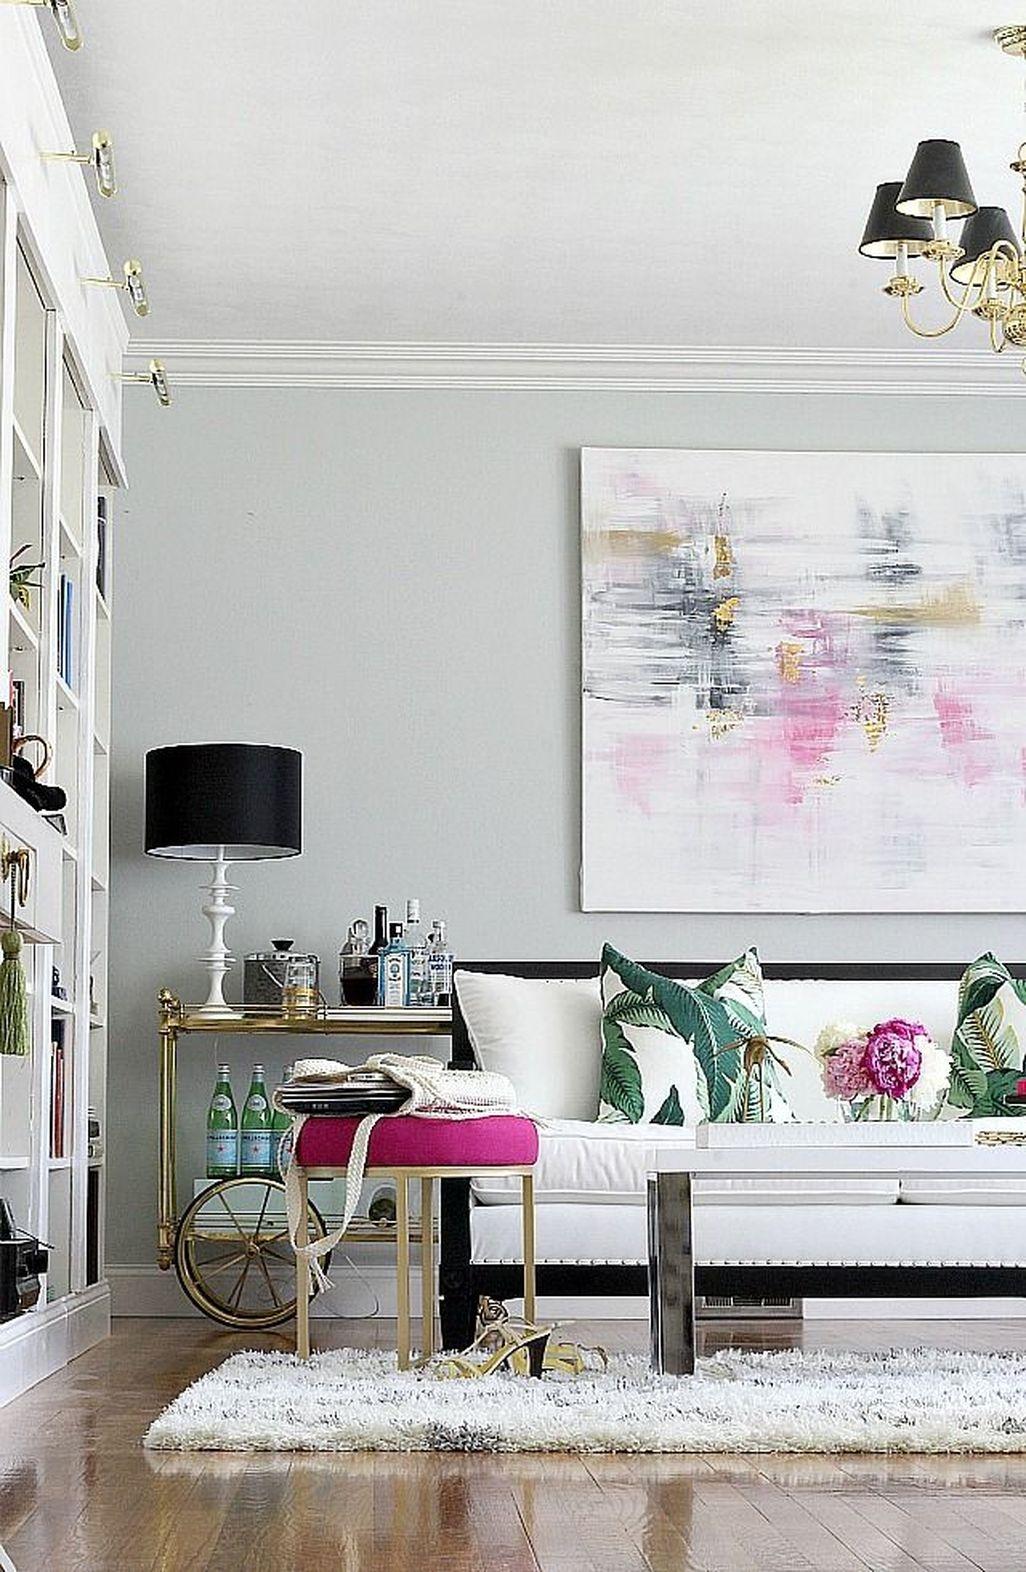 Easy Diy Spring And Summer Home Decor Ideas 13